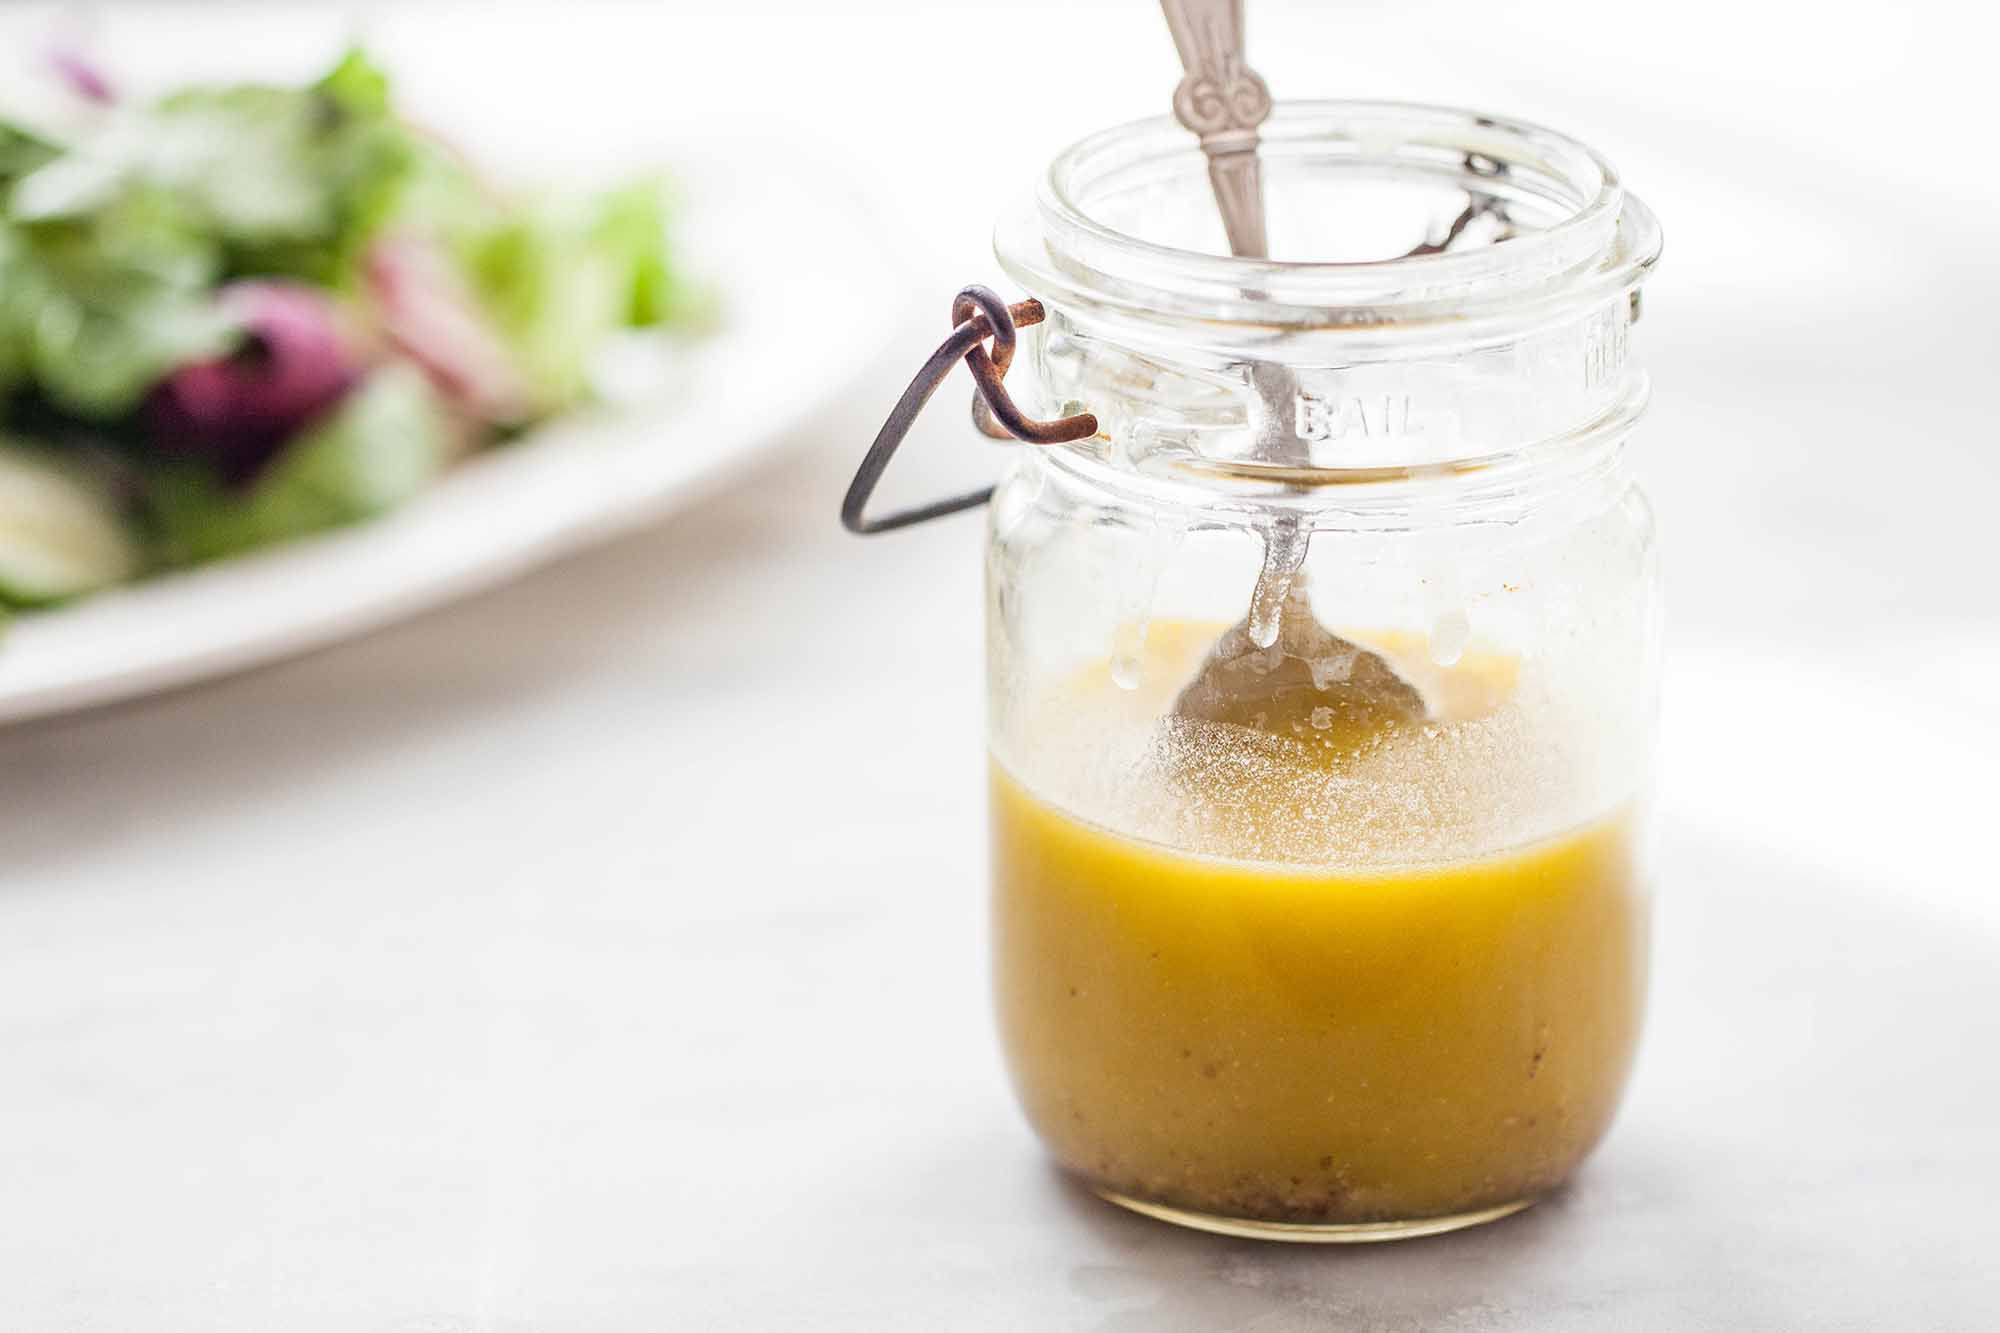 Homemade Honey Mustard Dressing - ball jar with honey mustard dressing wtih silver spoon